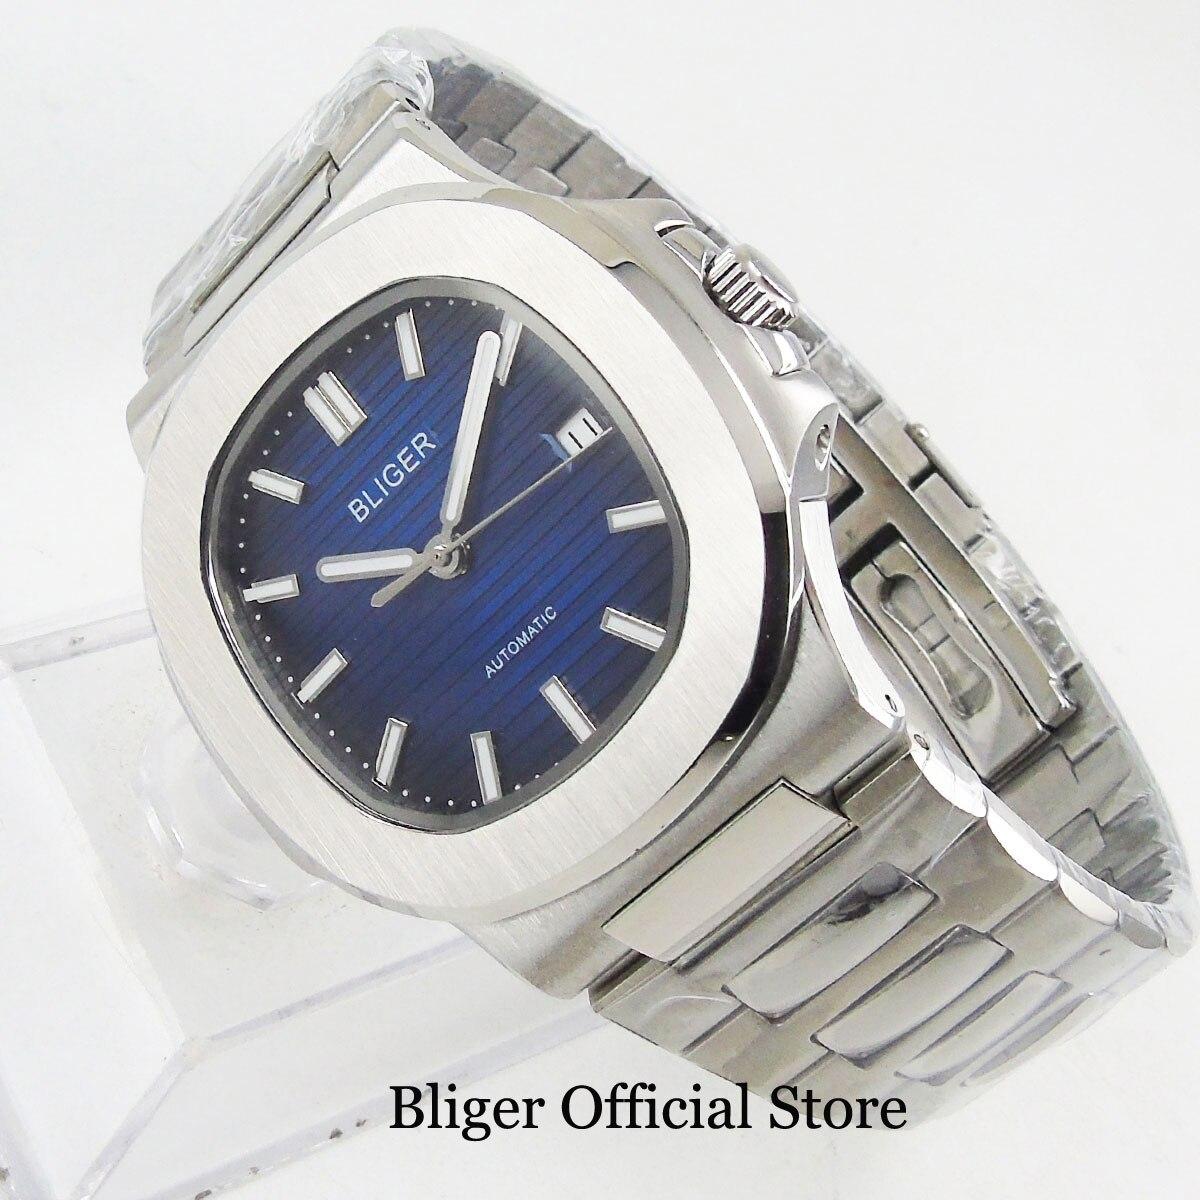 Luxury Style Dress 40mm Men Watch Automatic Movement Blue Sterile Dial Sapphire Glass Date Window Mental Strap Screw Down Crown - 4